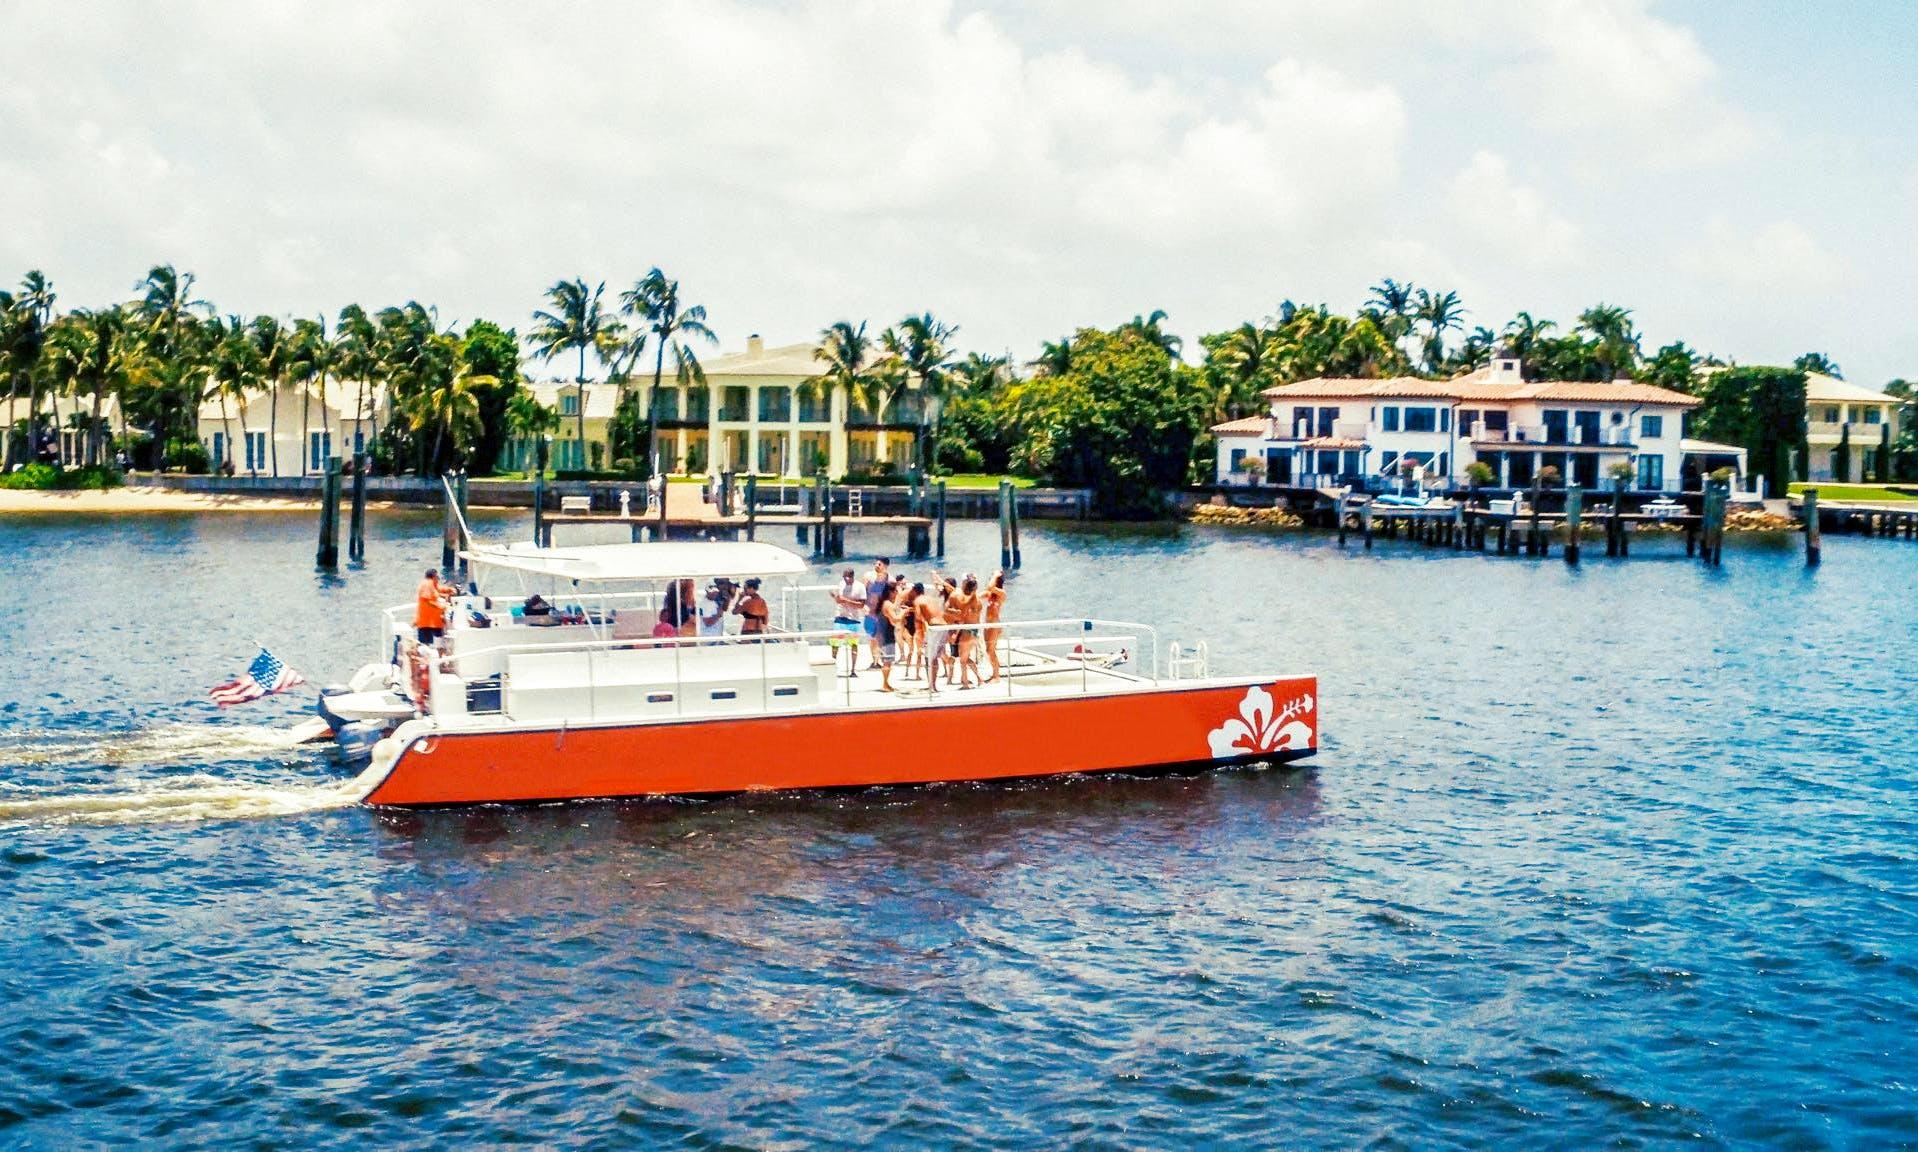 2 Hours Sightseeing Cruise aboard a 50′ Catamaran in West Palm Beach